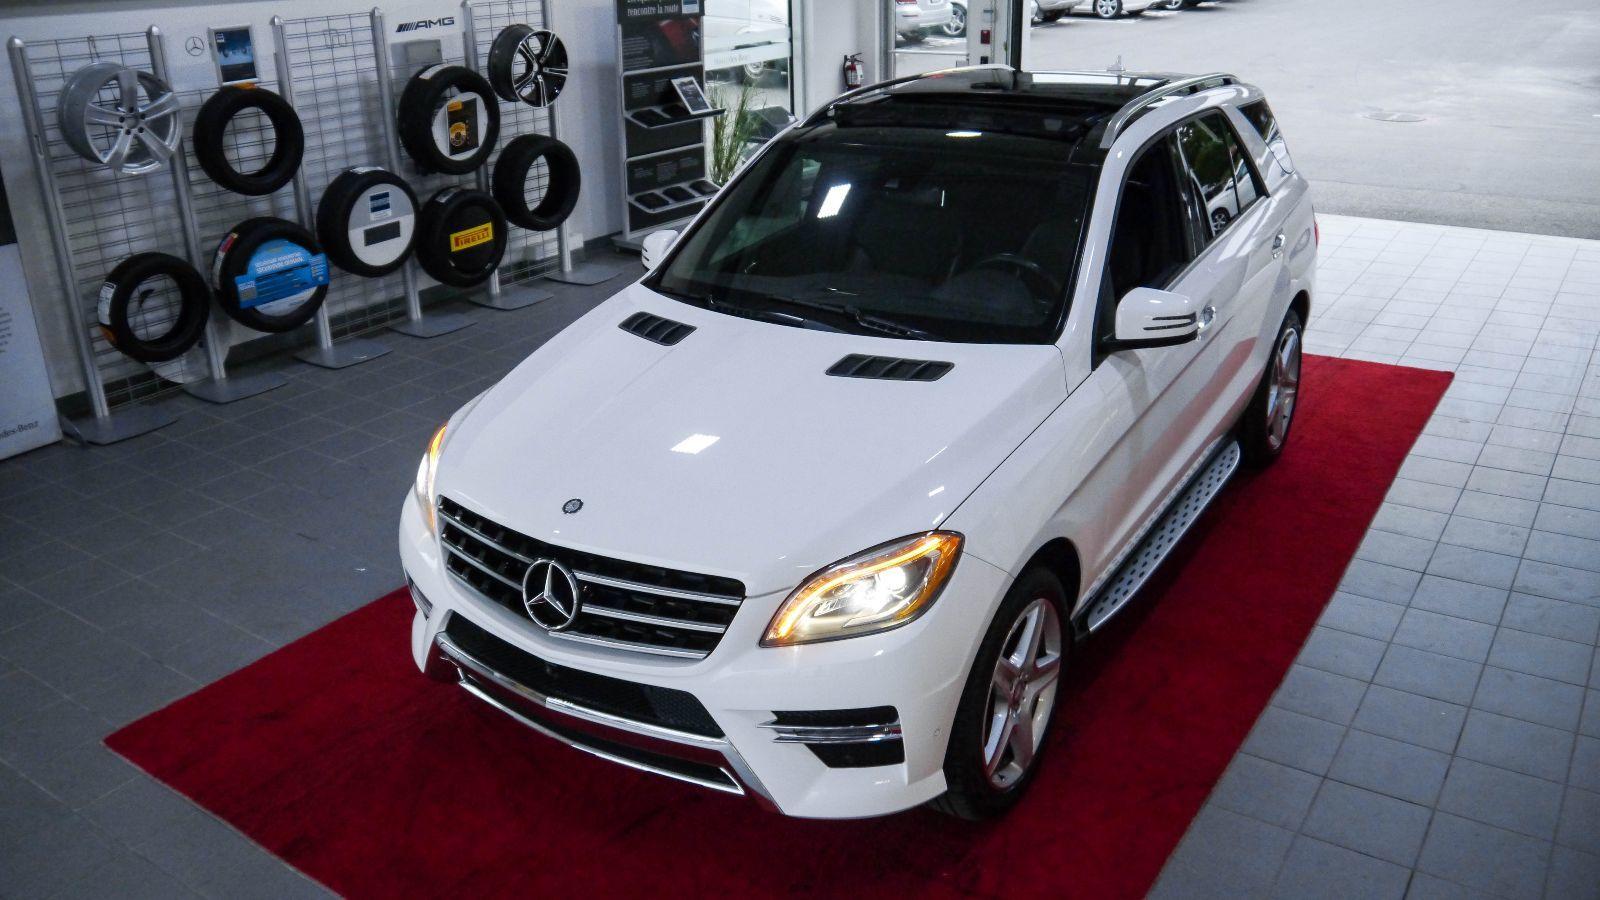 Mercedes benz de sherbrooke mercedes benz m class 2015 for 2015 mercedes benz m class